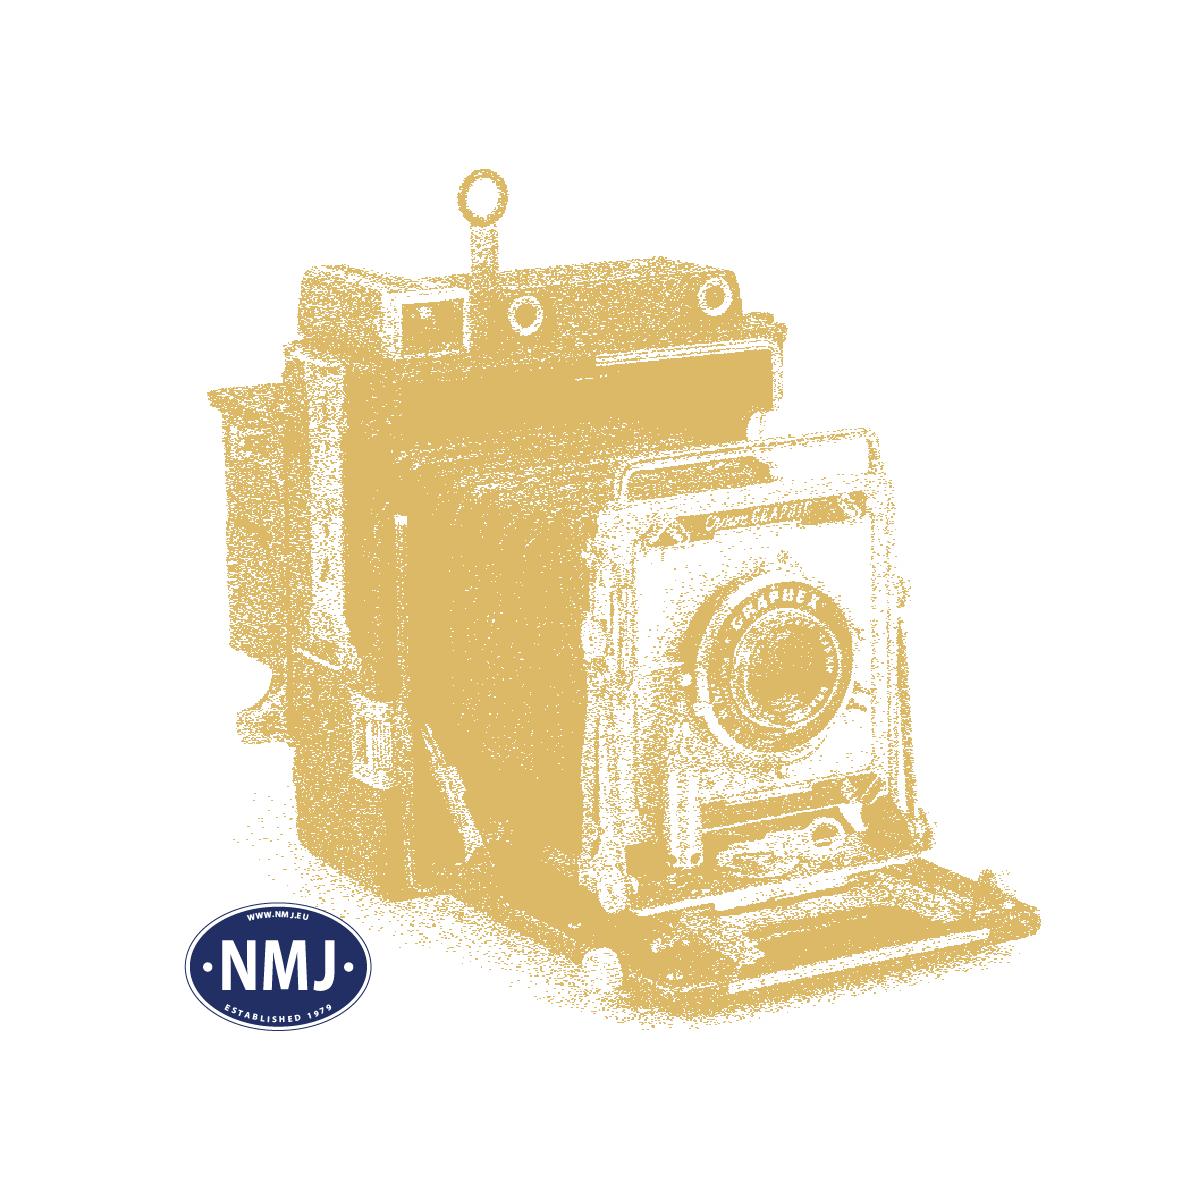 NMJT94140 - NMJ Topline NSB El14 2167, Nydesign, DCC m/ Lyd